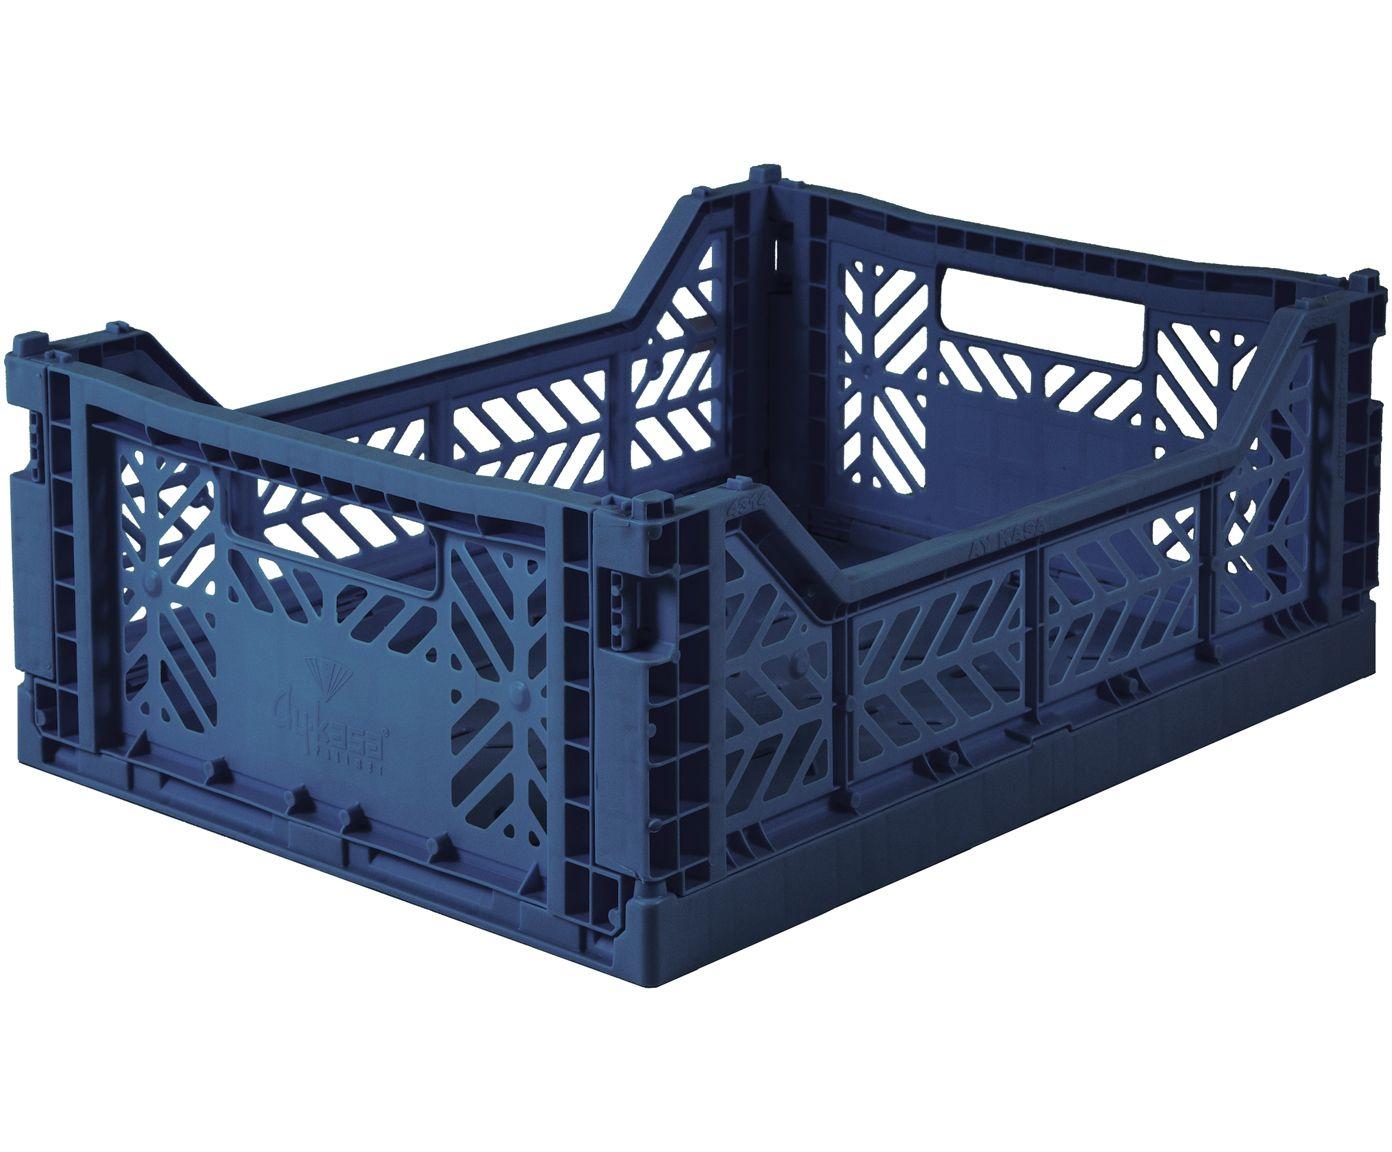 Klappbox Navy Stapelbar Medium Blaue Mobel Kisten Aufbewahrung